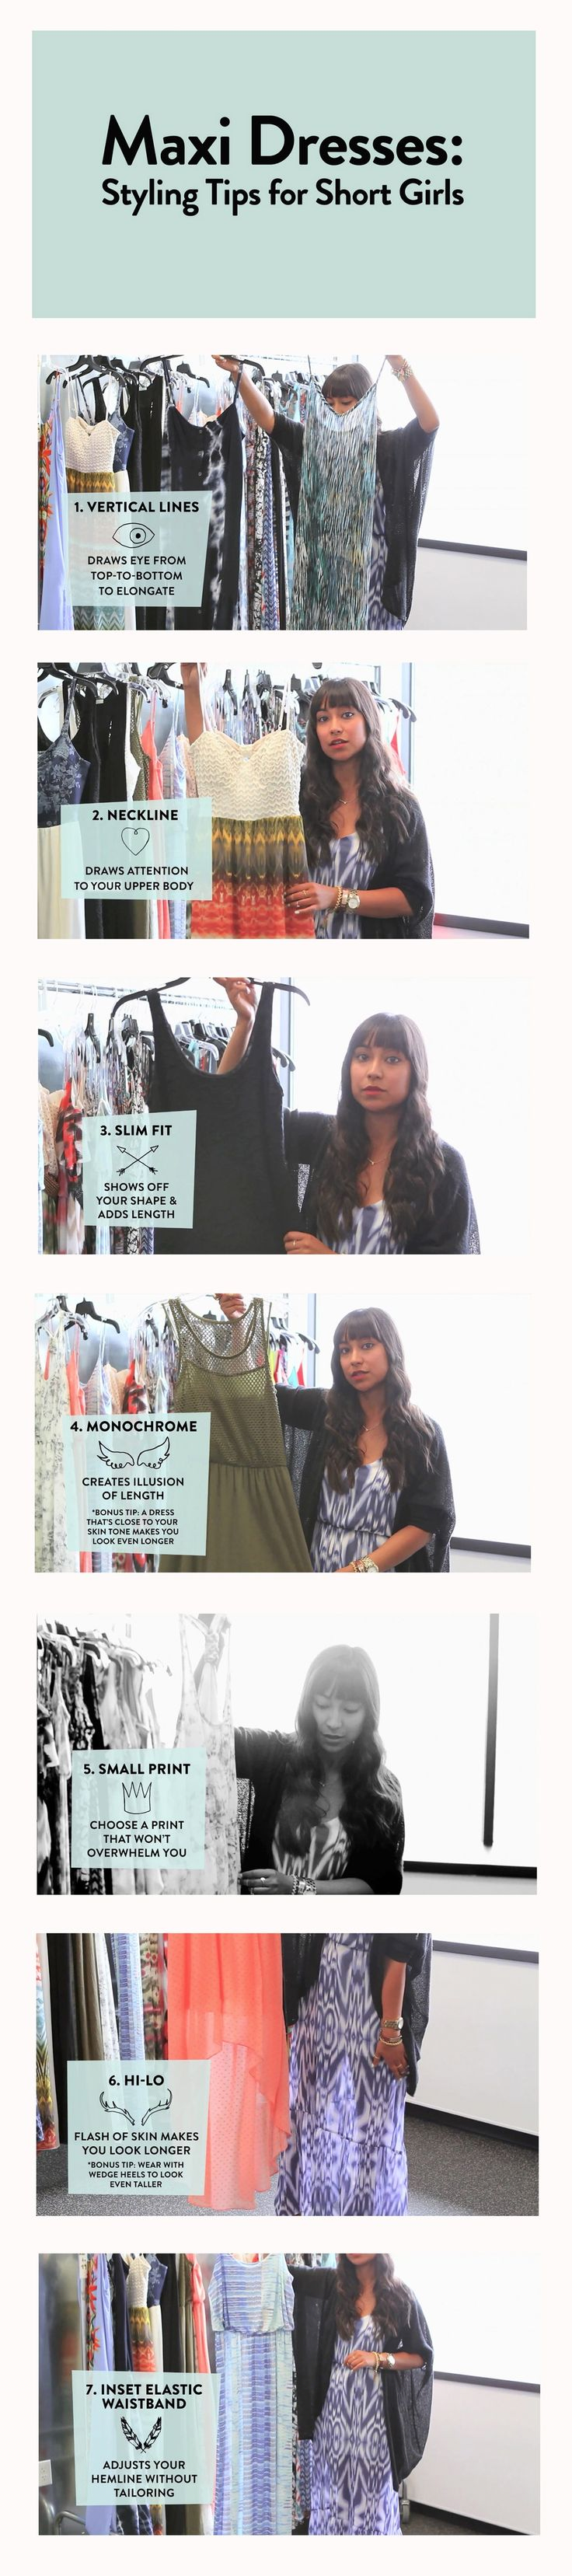 Maxi Dresses: Styling Tips for Short Girls